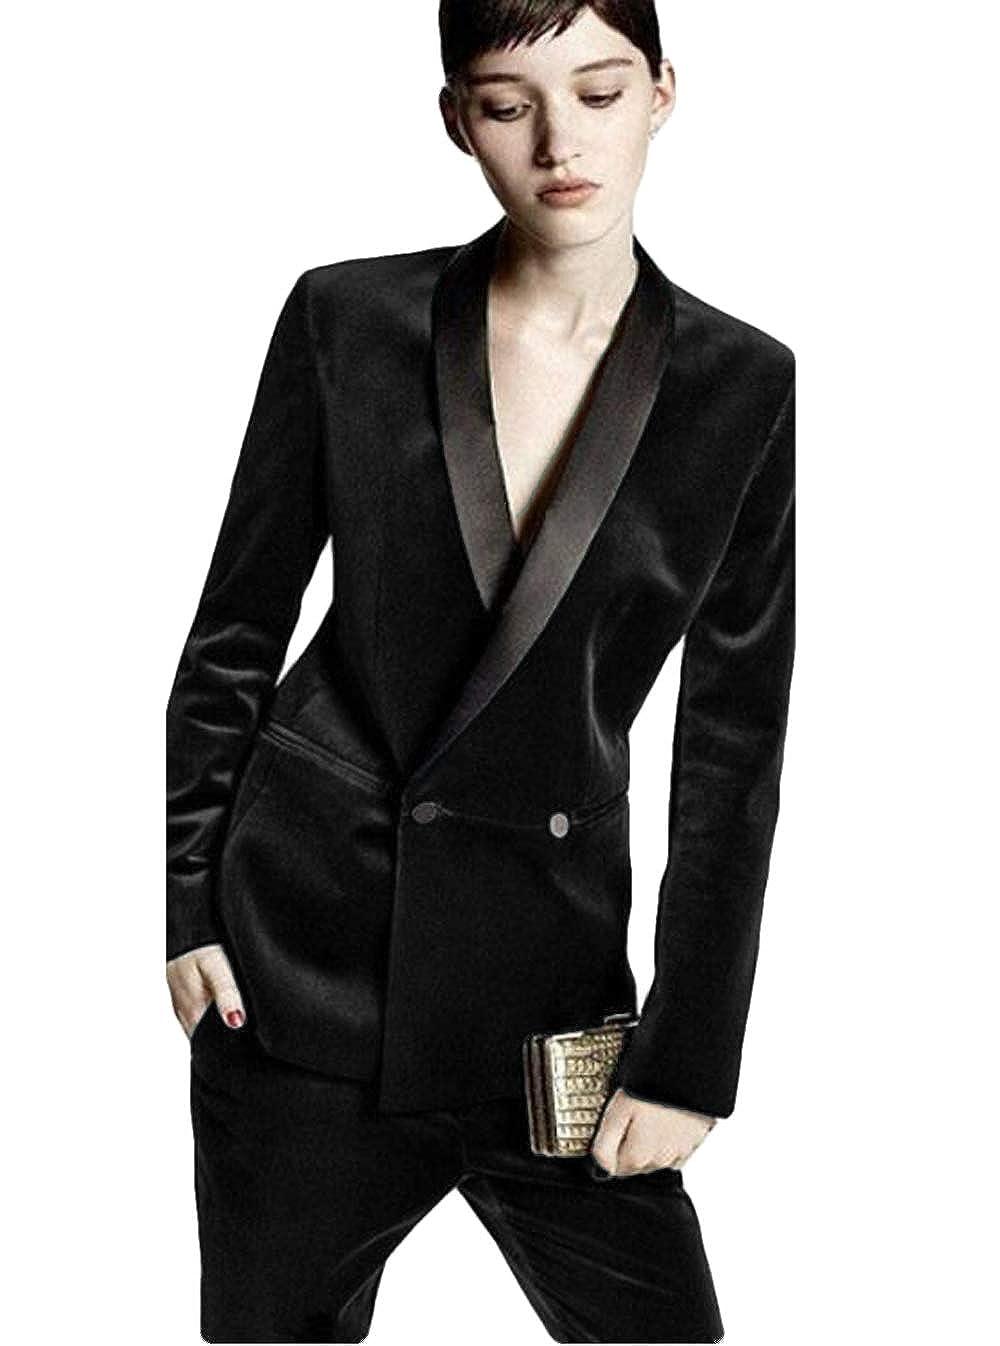 WZW WomensTailored Formal Suits Female Business Suits Velvet Evening Trouser Suit